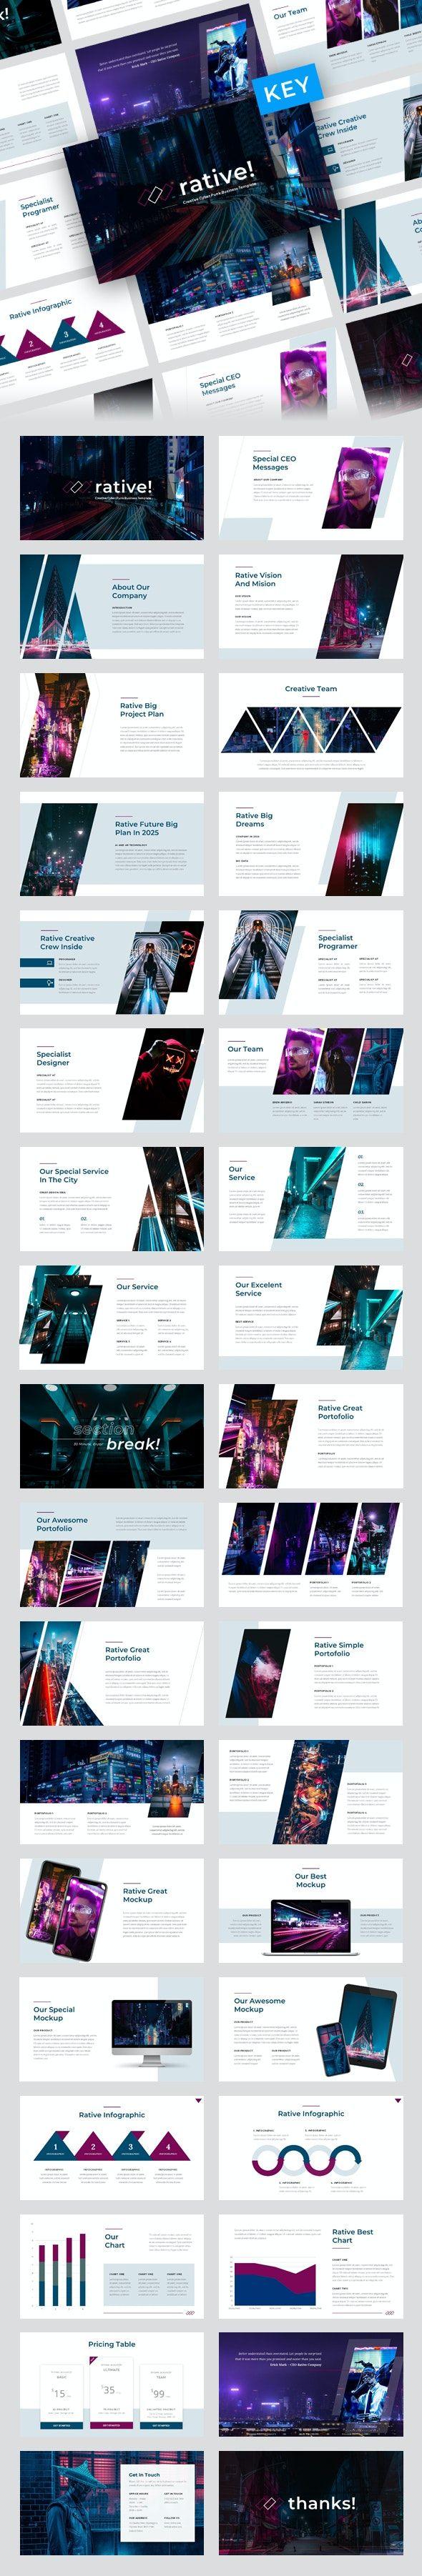 Rative - Creative Cyber Punk Business Keynote Template by PradiptaCreative Discount 50%